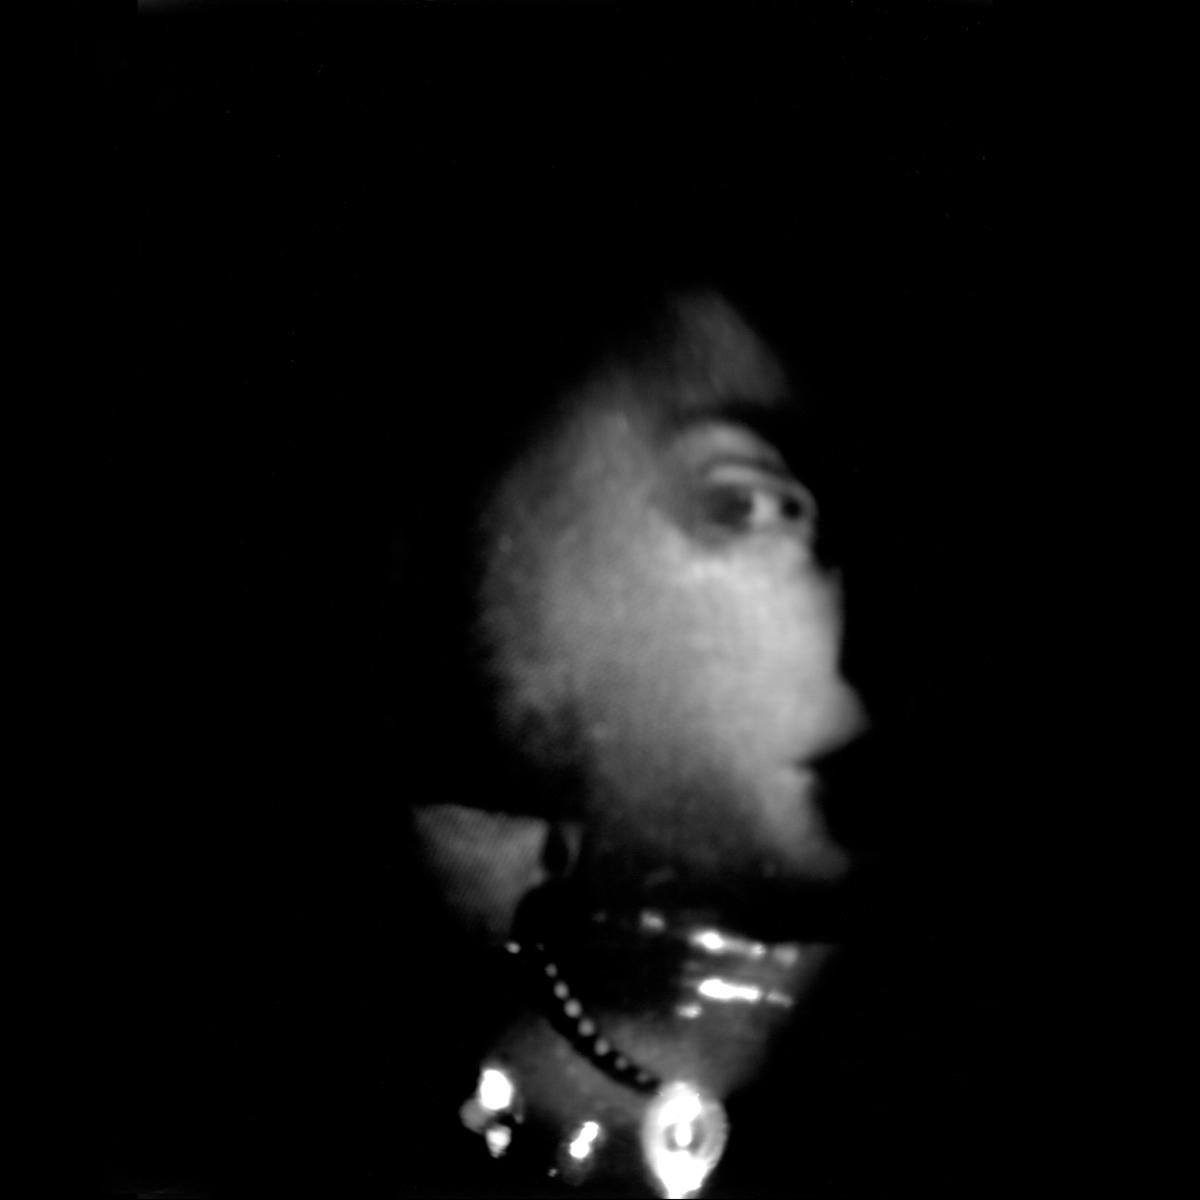 Aurelia_Frey_20110711_Foret_obscure_0108